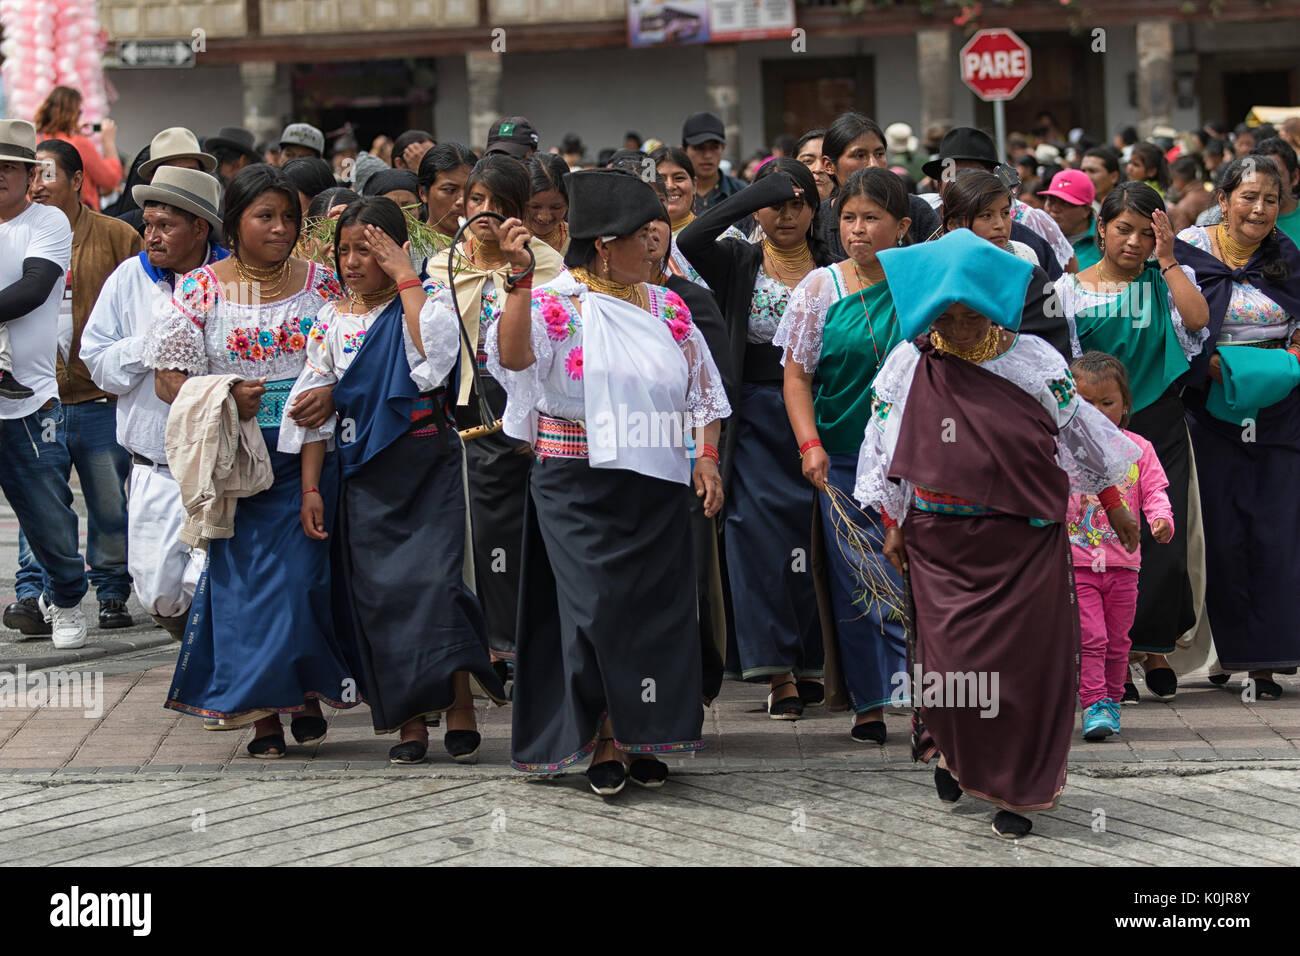 July 1, 2017 Cotacachi, Ecuador: indigenous Kichwa women marching on the street during Punchi Warmi celebration - Stock Image